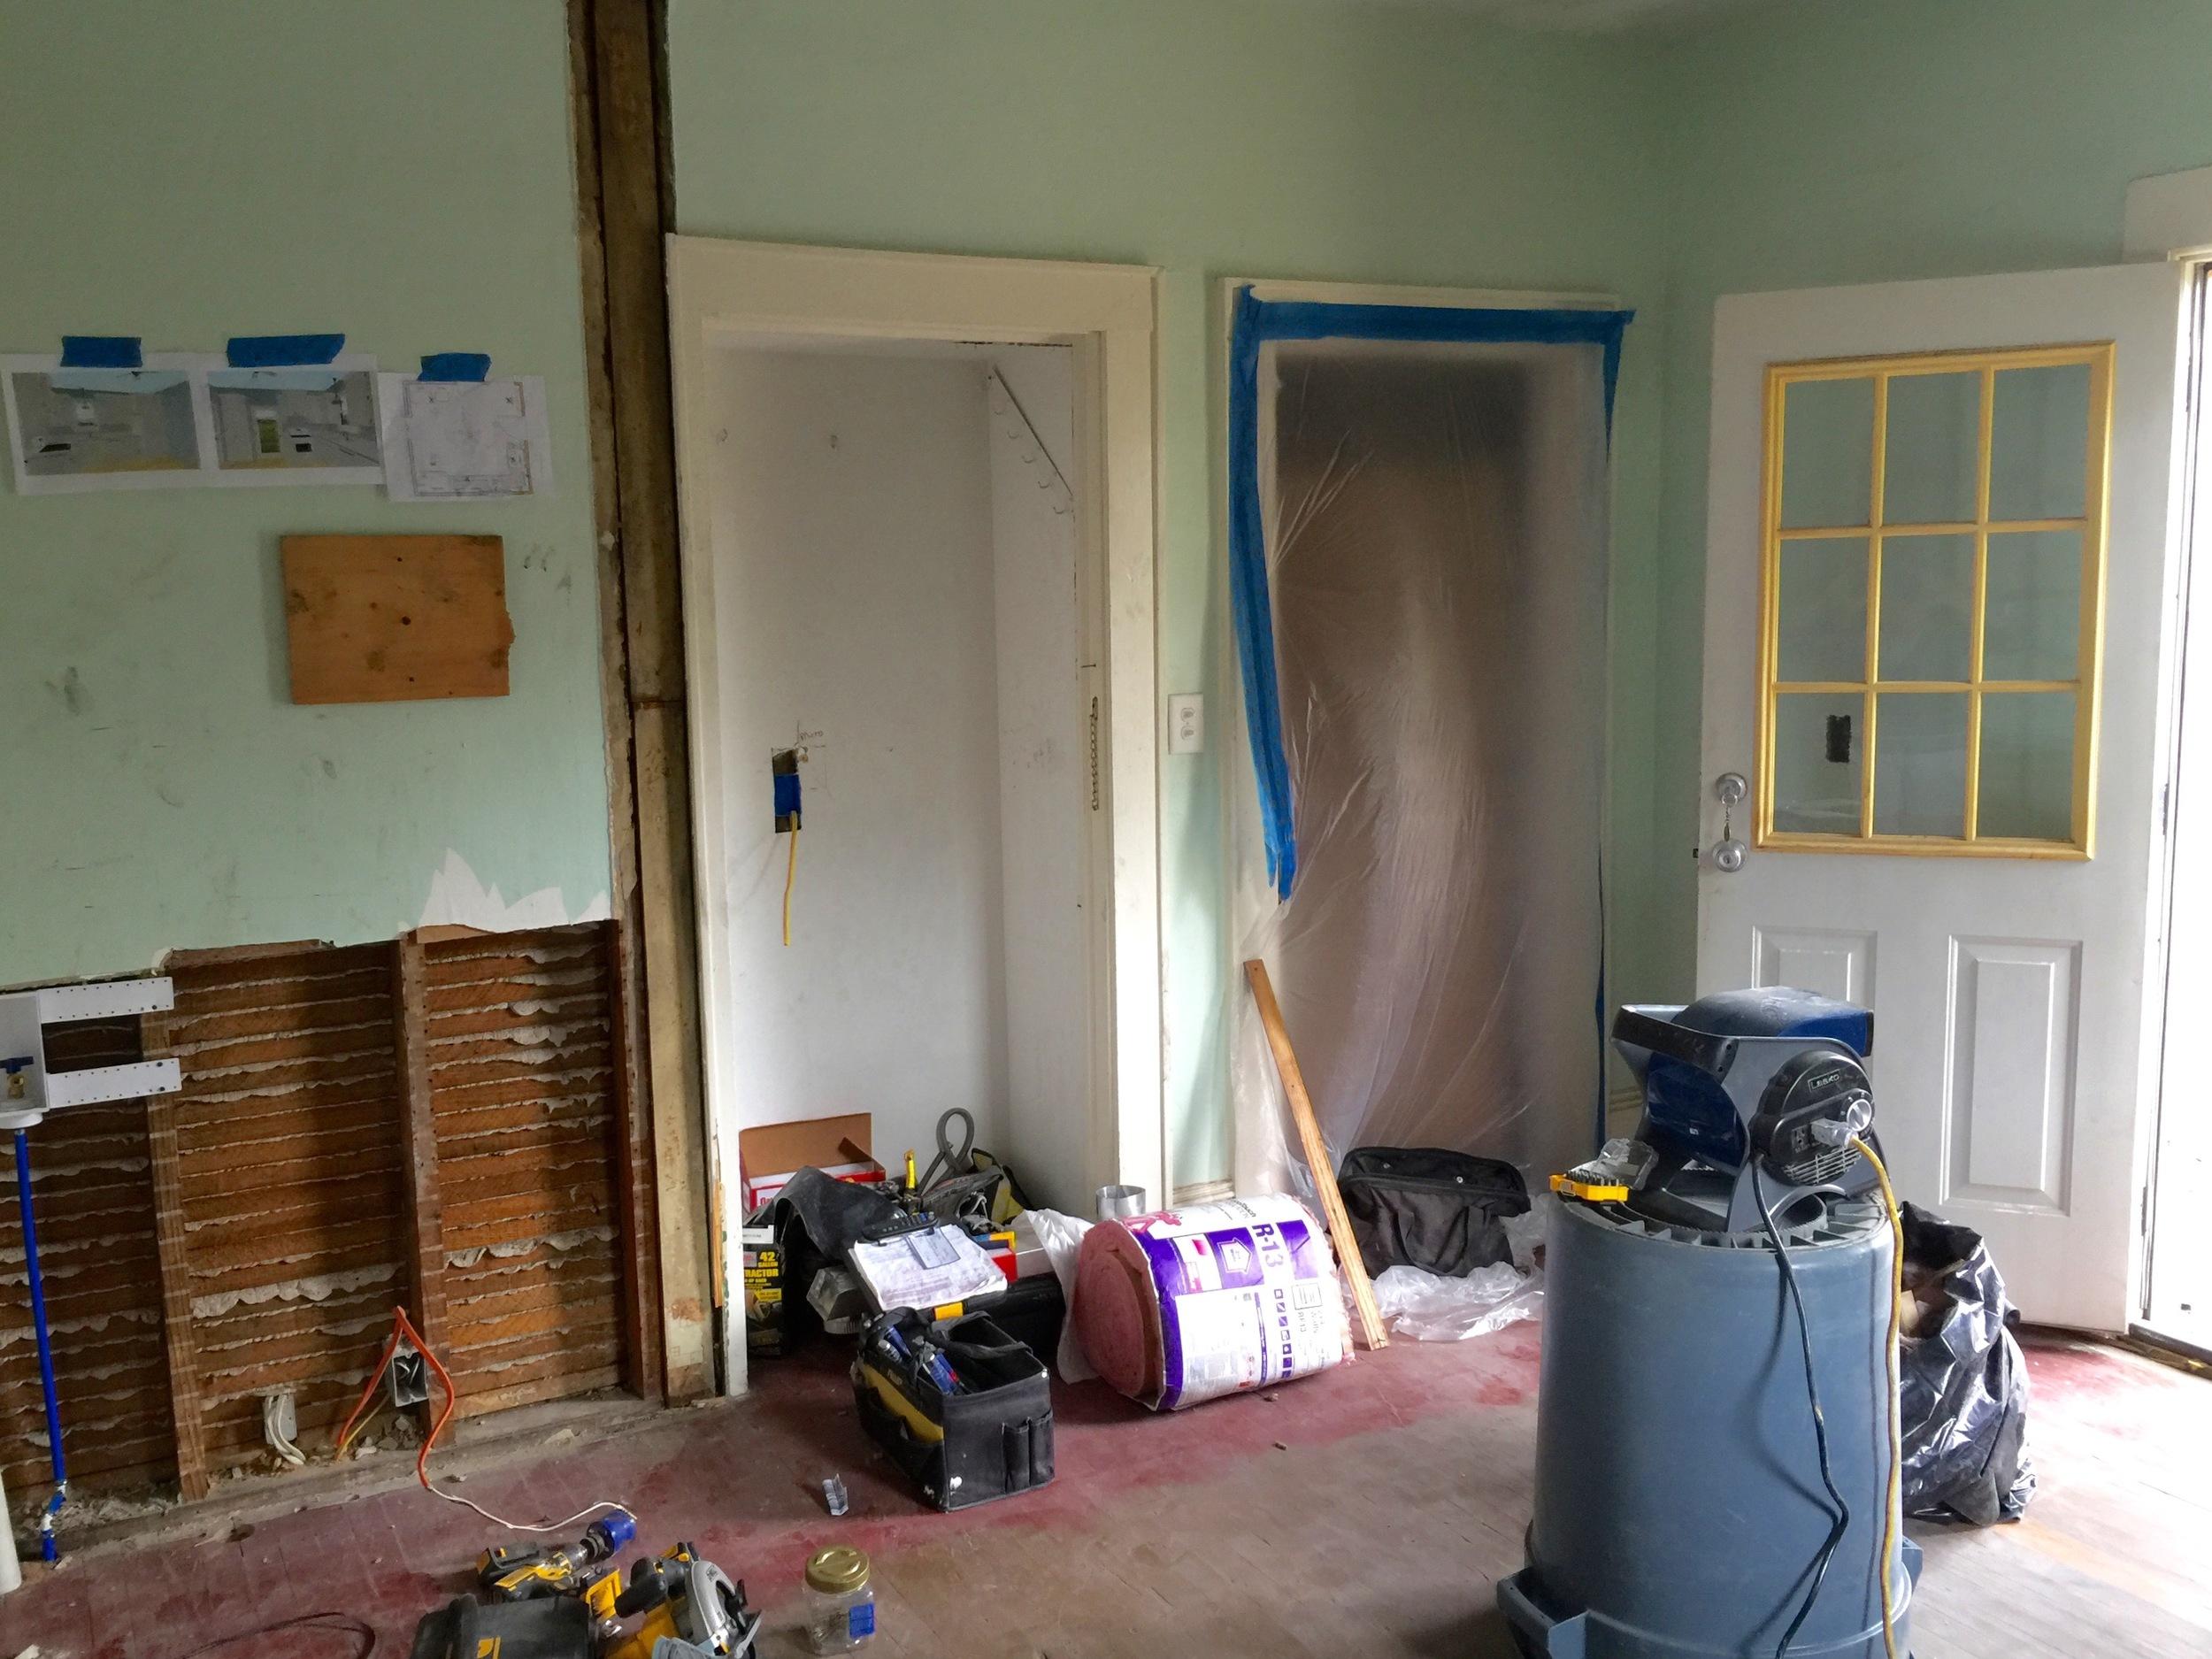 After the demolition